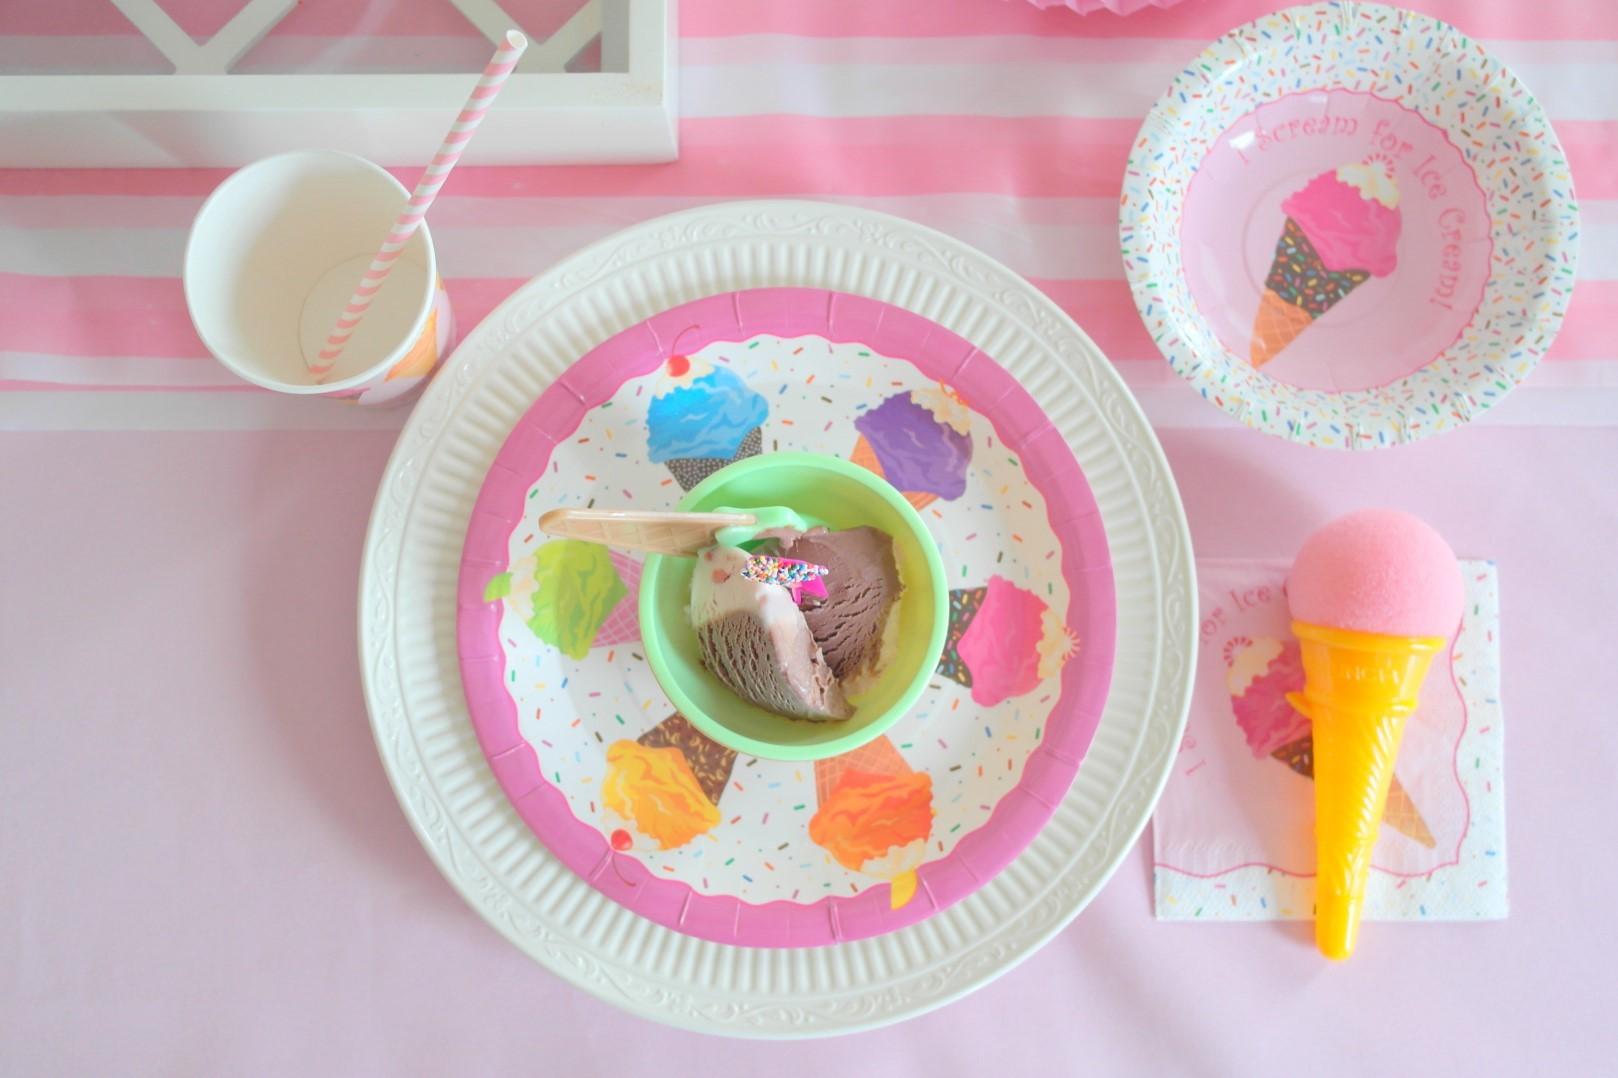 ice cream-assiette-neuf-mois